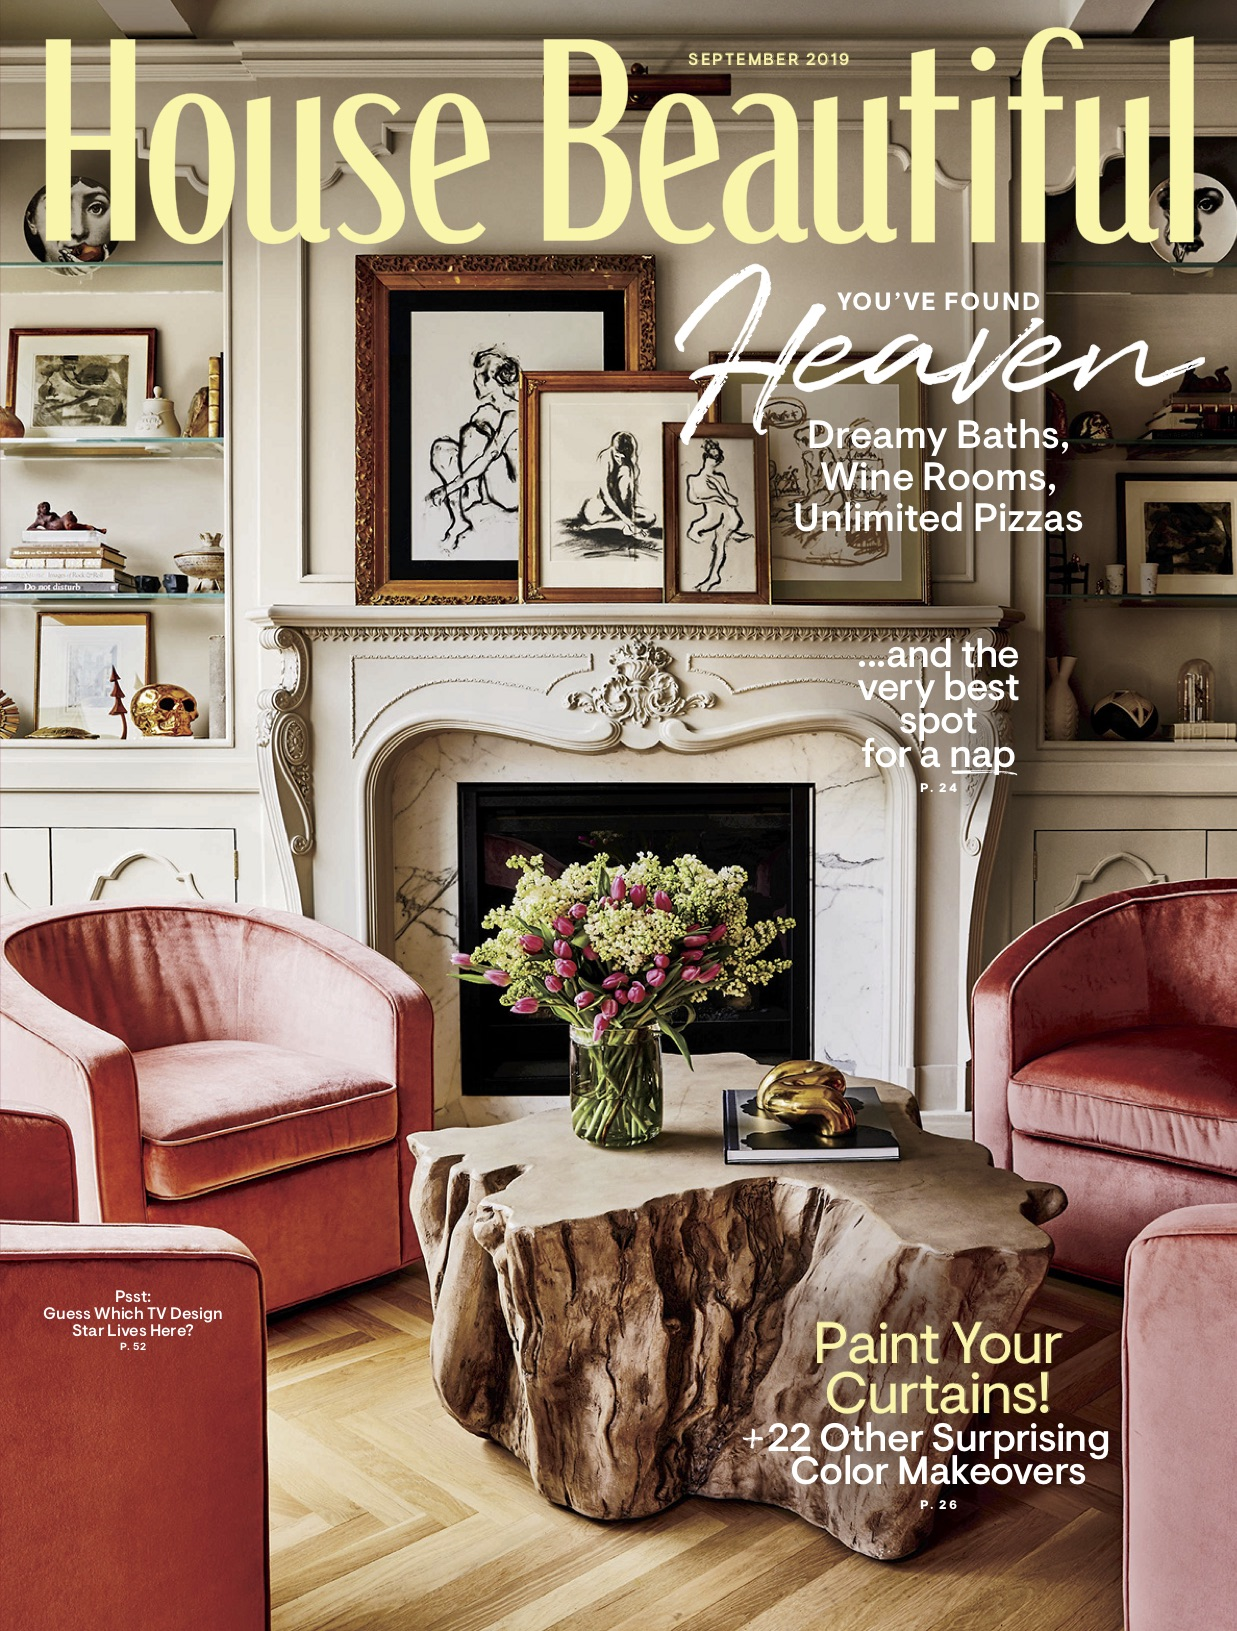 Raleigh Nc Interior Designer Niki Mcneill Featured In House Beautiful Magazine Singlebubblepop